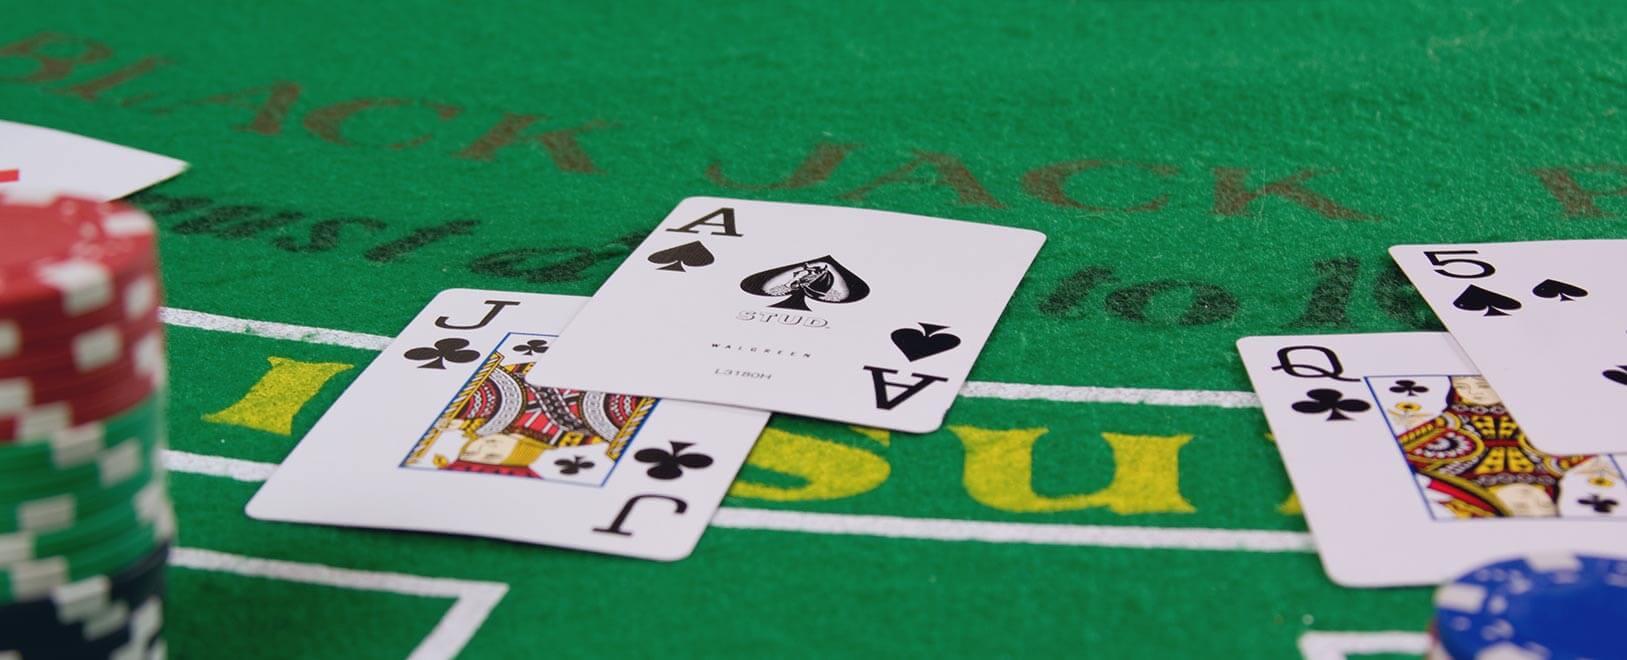 CasinoScout blackjack CS